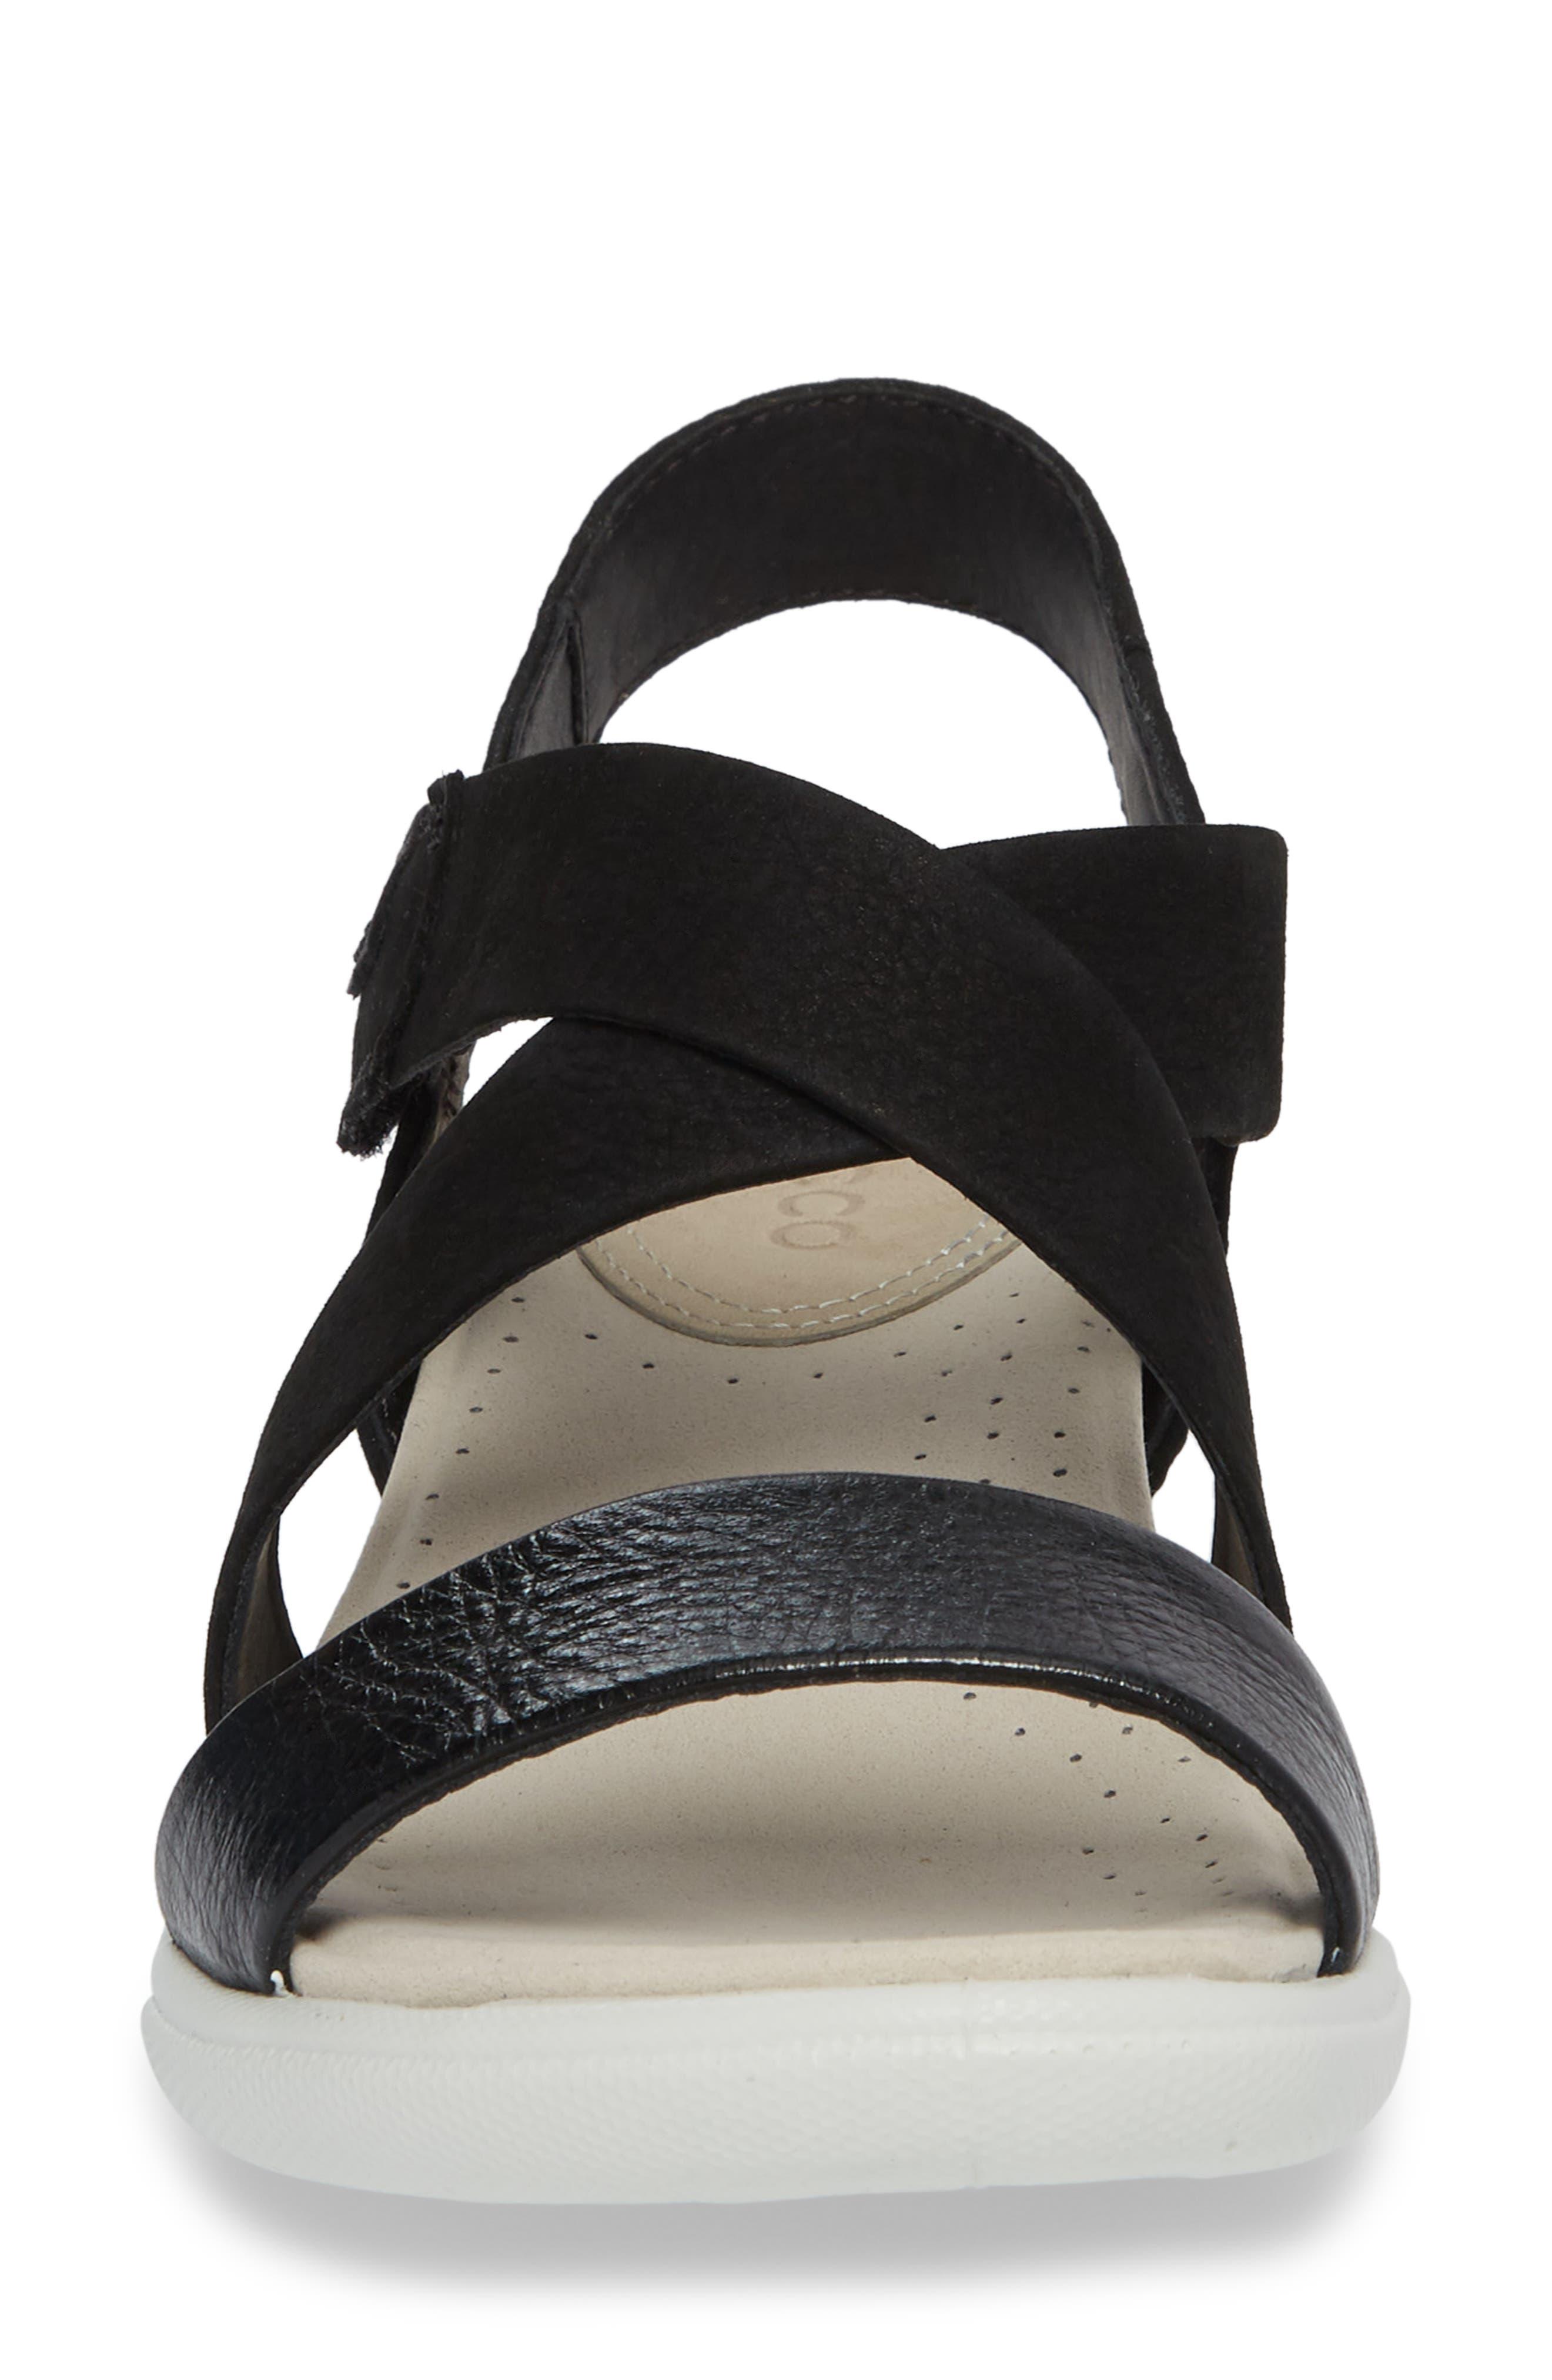 Damara Cross-Strap Sandal,                             Alternate thumbnail 4, color,                             Black Leather